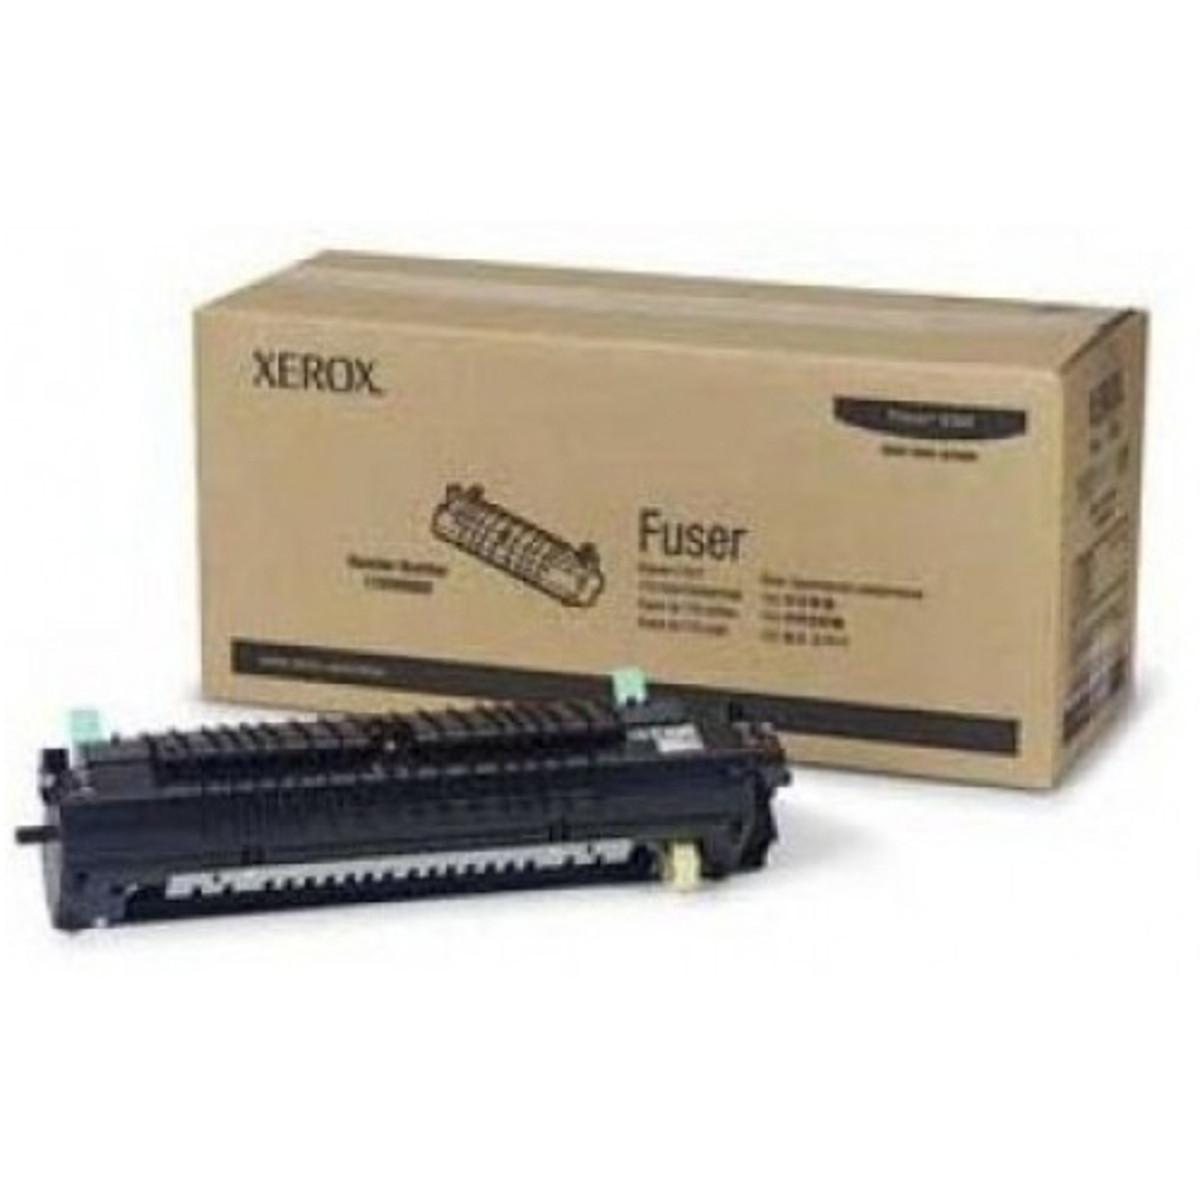 Xerox DPC2255 Fuser Unit